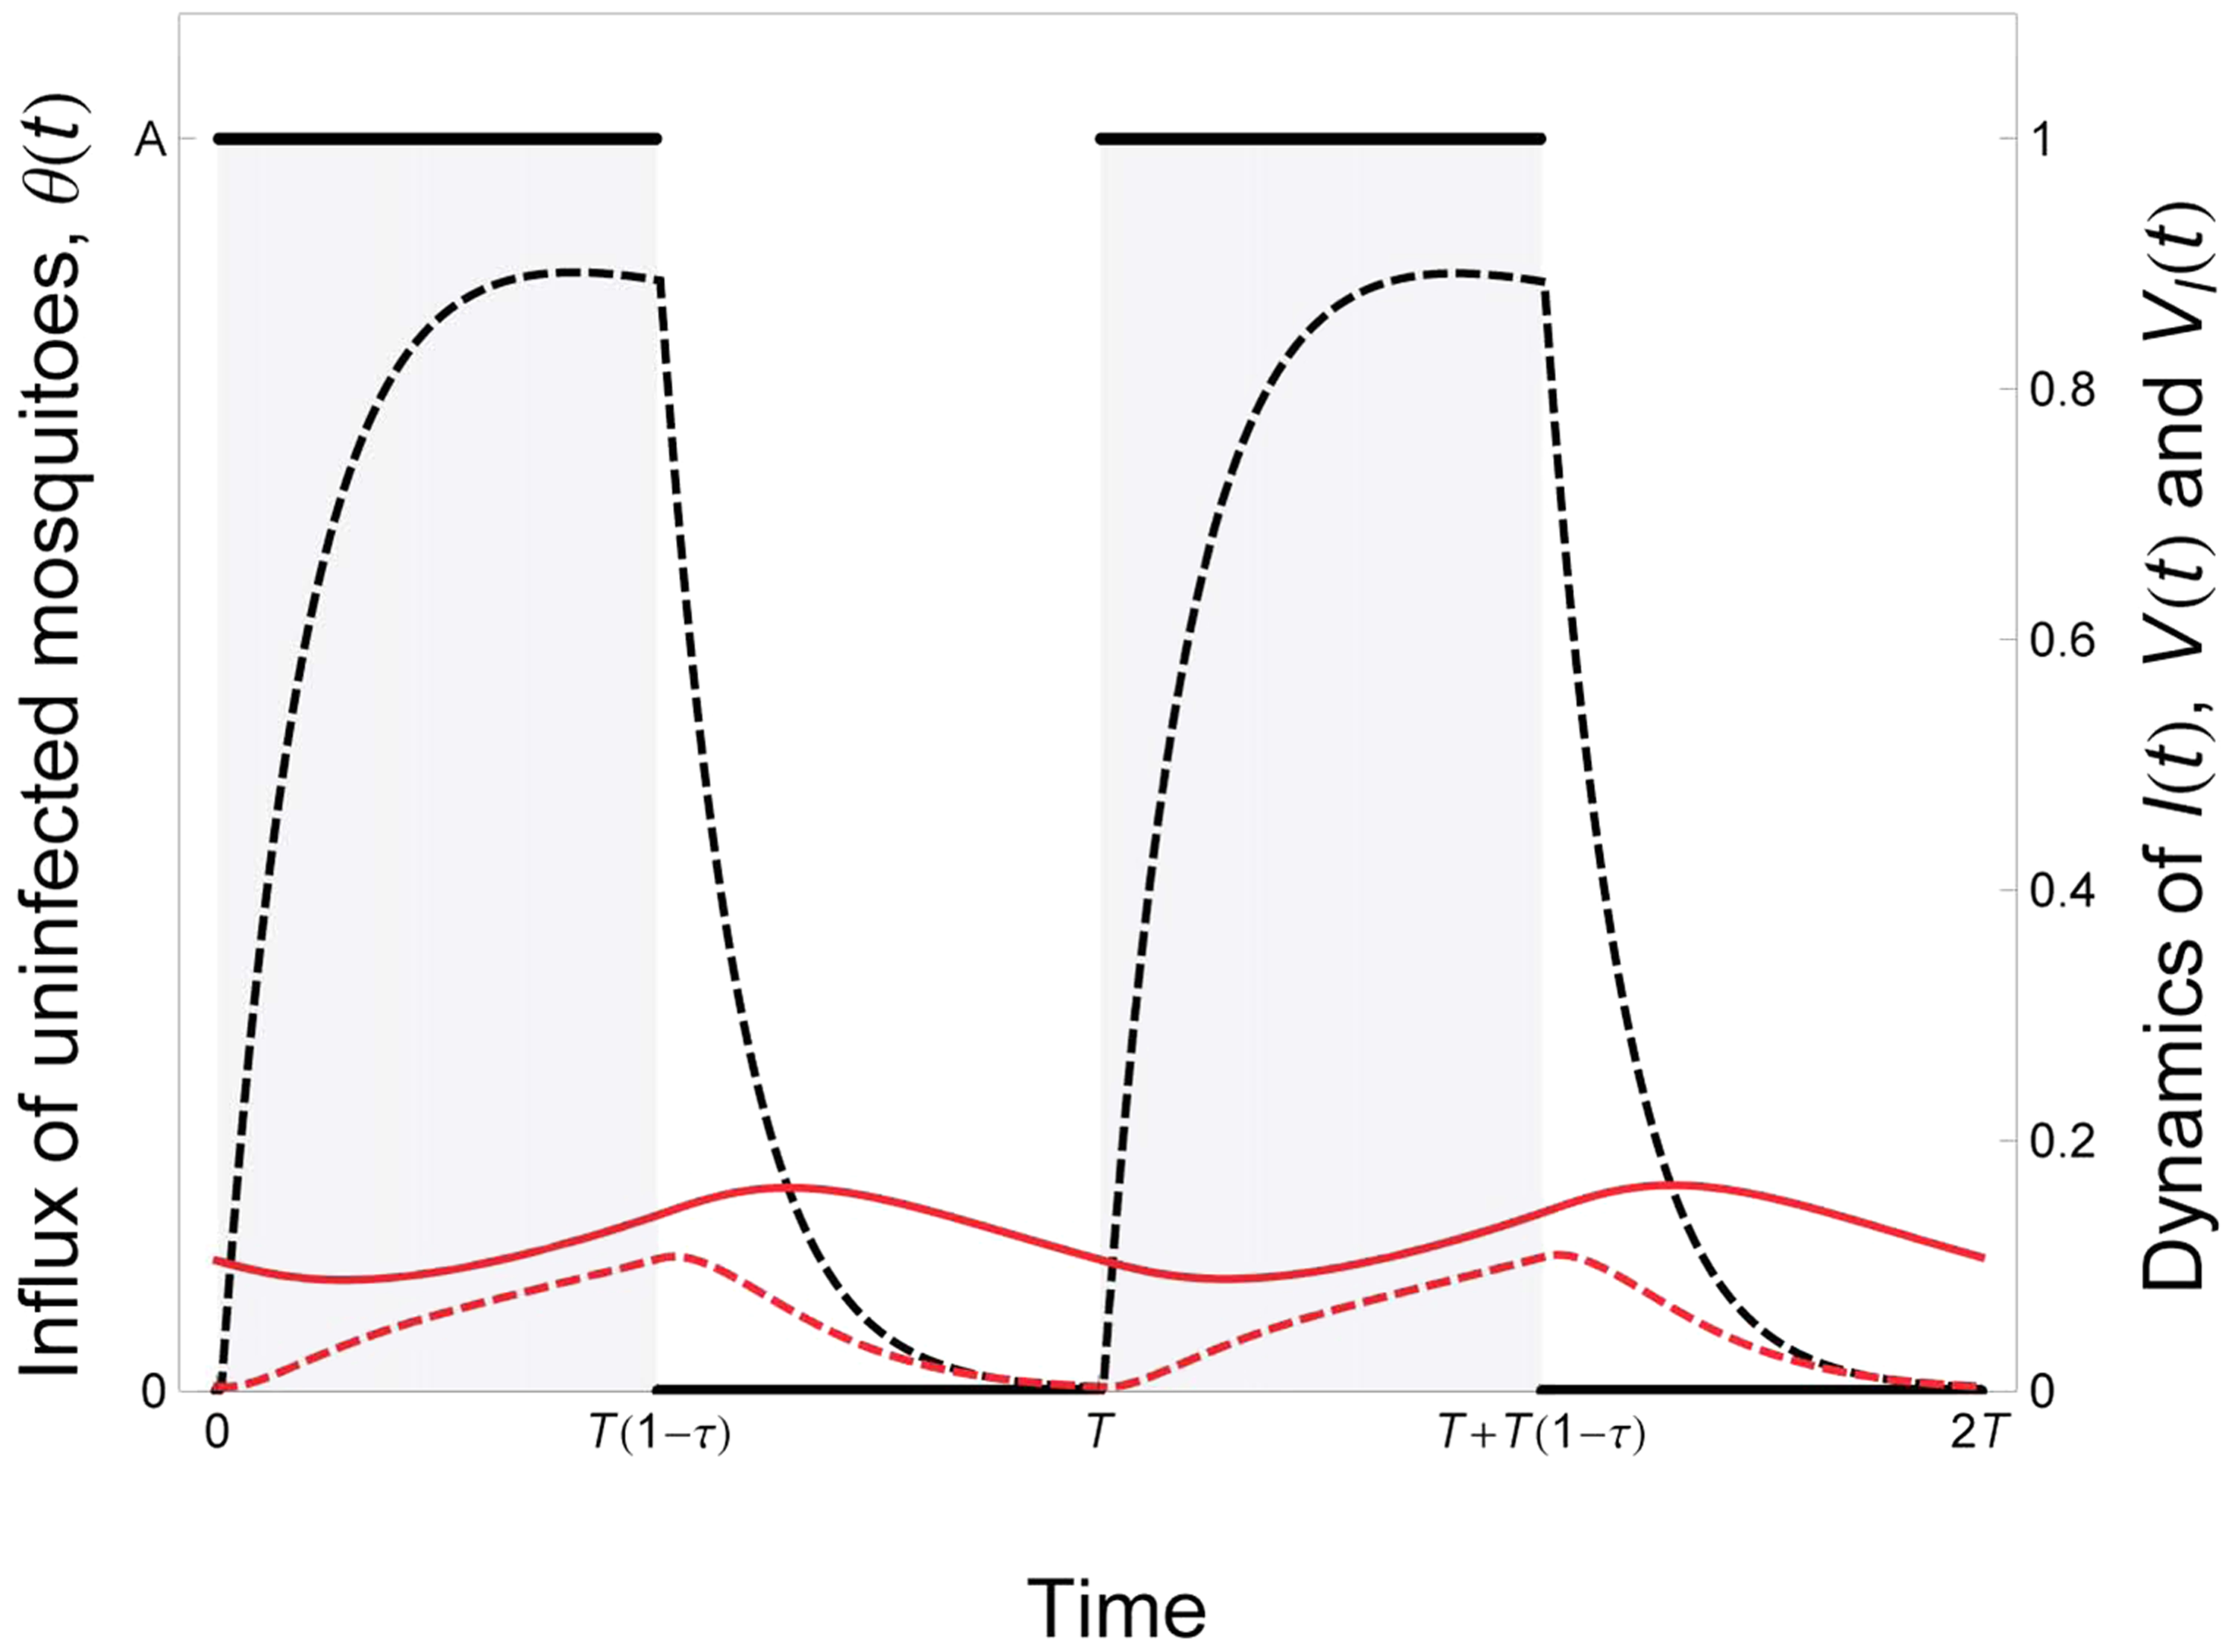 Epidemiological dynamics of a vector-borne disease in a seasonal environment.